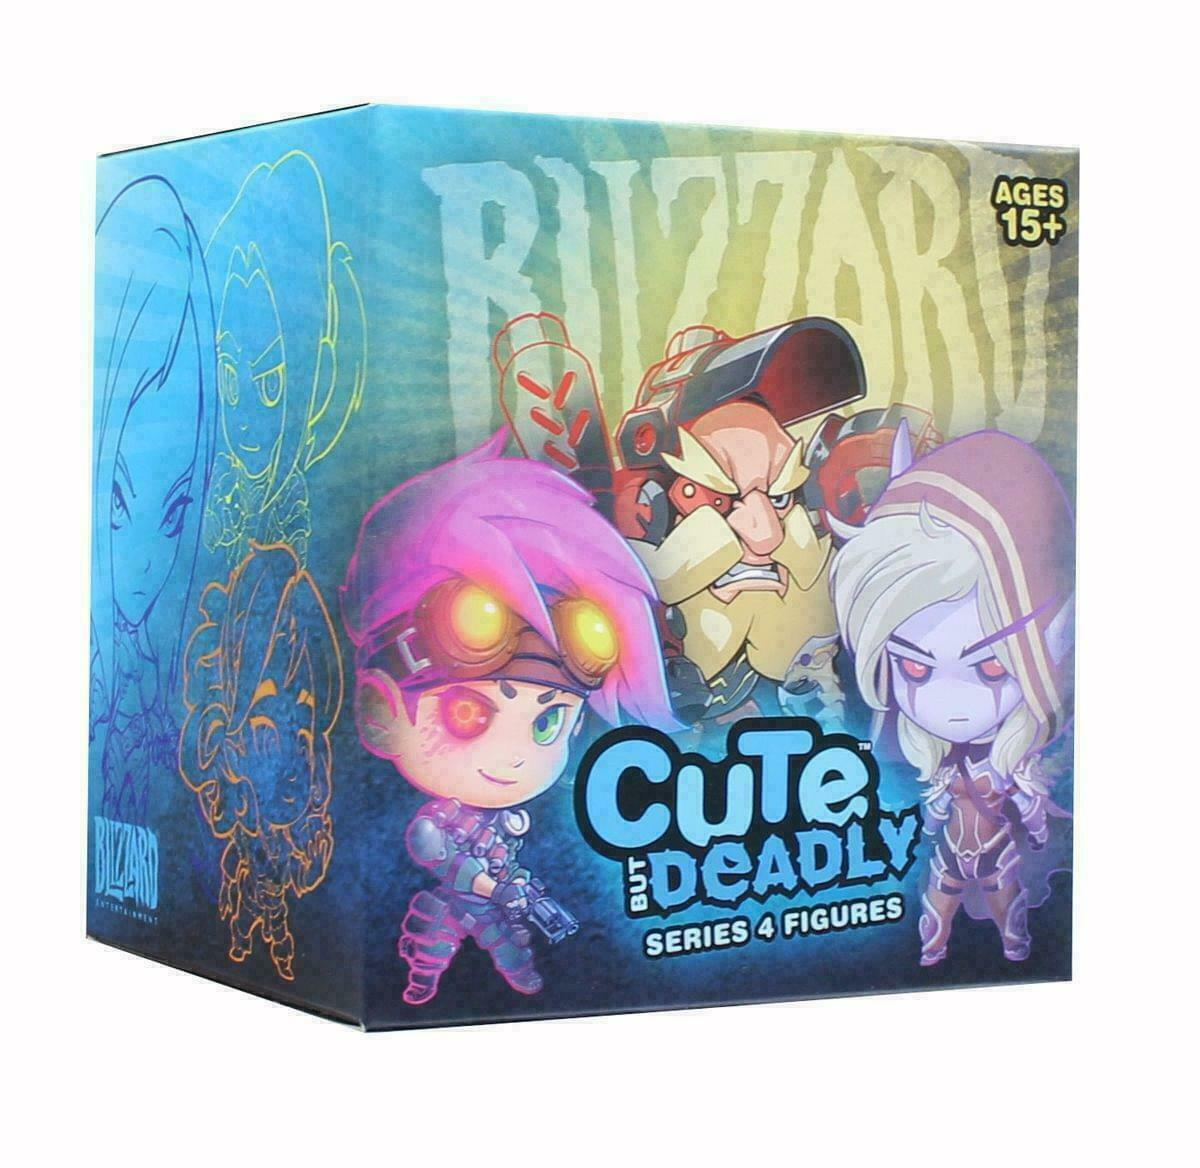 Overwatch Cute But Deadly Series 4 Random Blind Box Figure Blizzard NEW